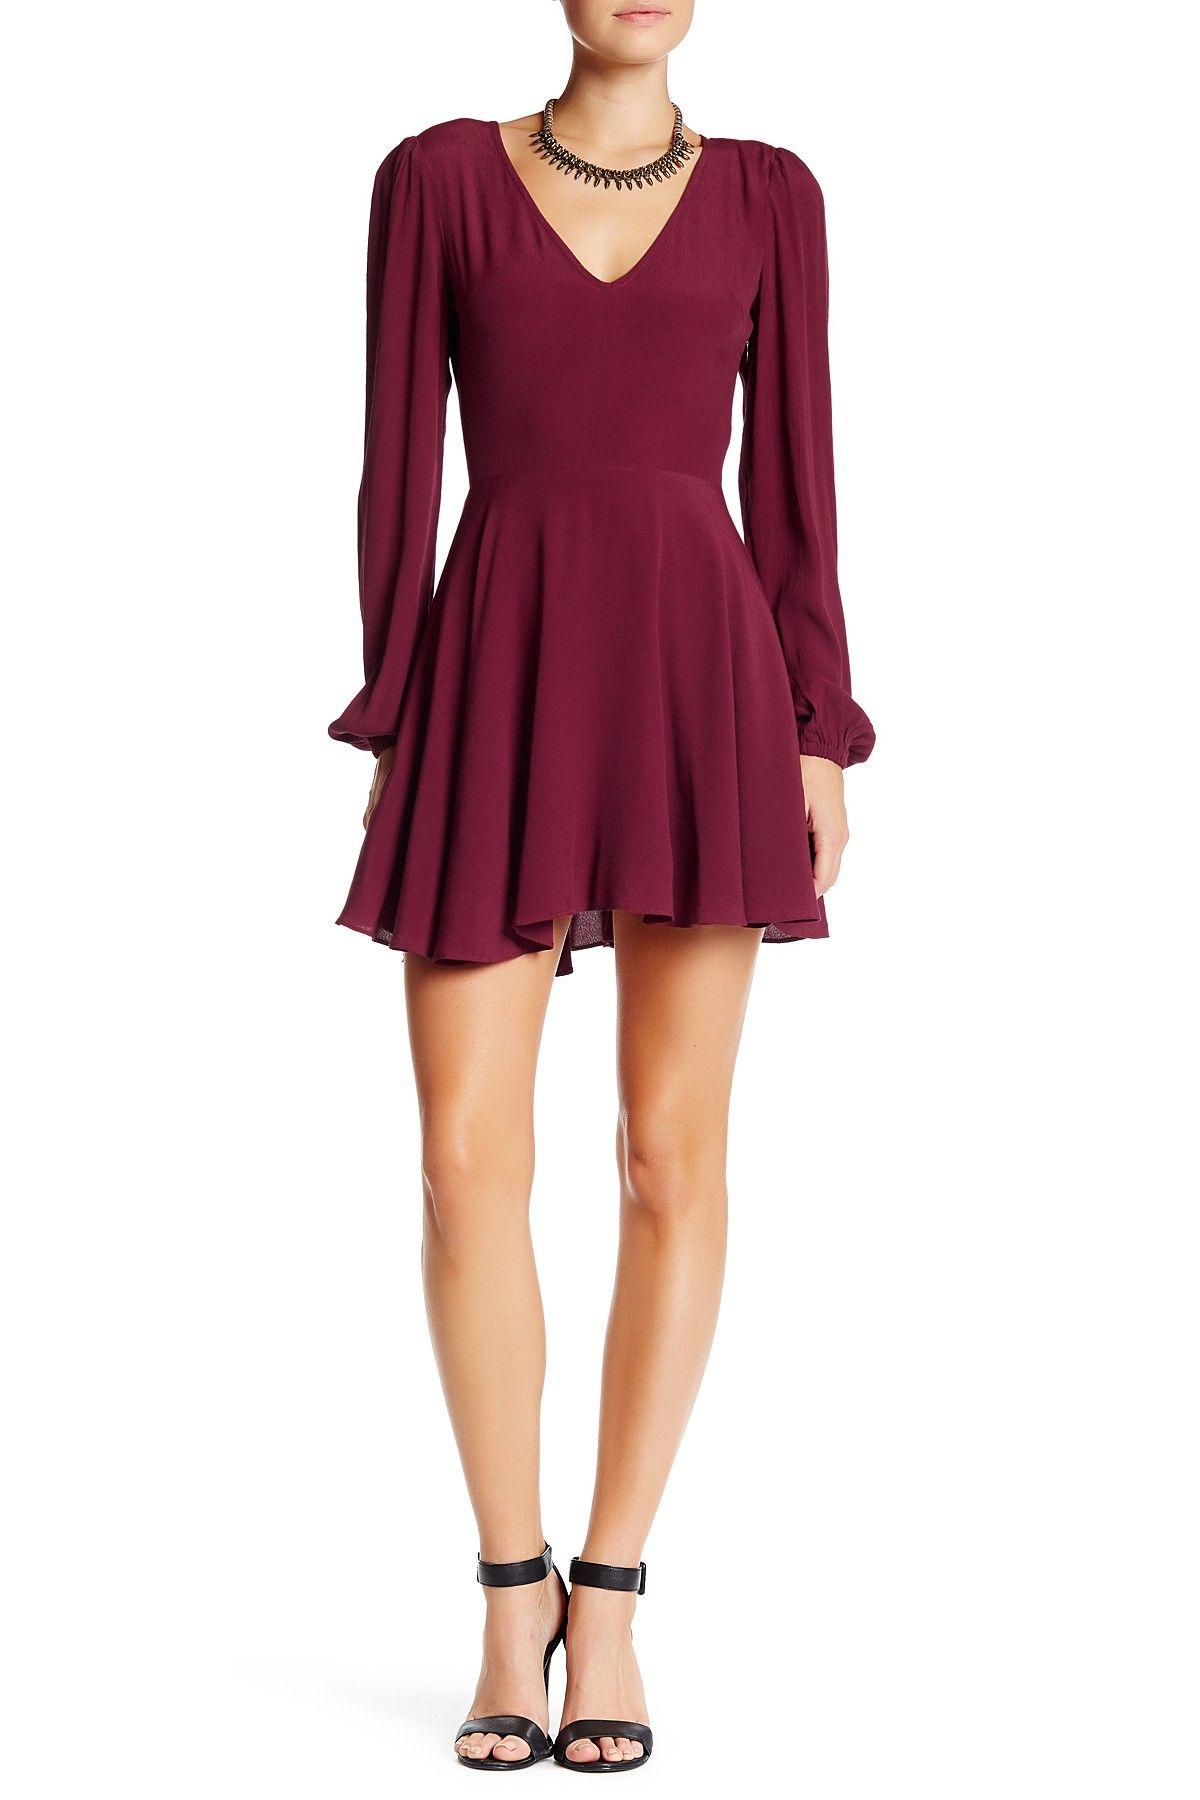 Shimmy Long Sleeve Fit N Flare Dress Fit N Flare Dress Flare Dress Dresses [ 1800 x 1200 Pixel ]